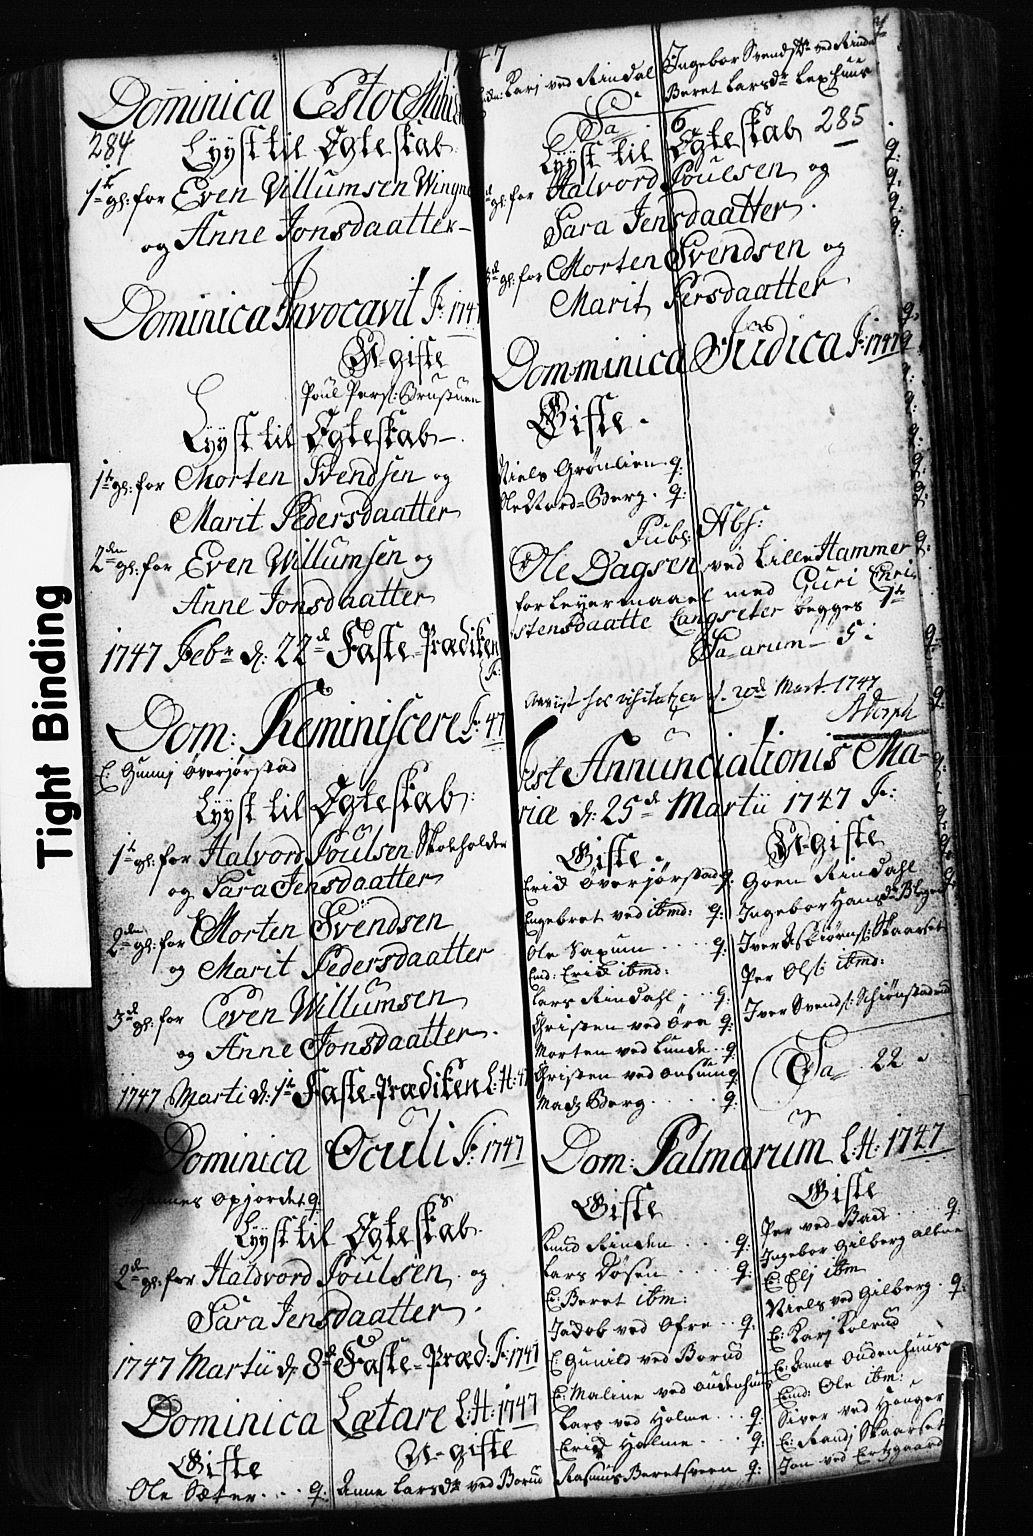 SAH, Fåberg prestekontor, Klokkerbok nr. 2, 1741-1756, s. 284-285